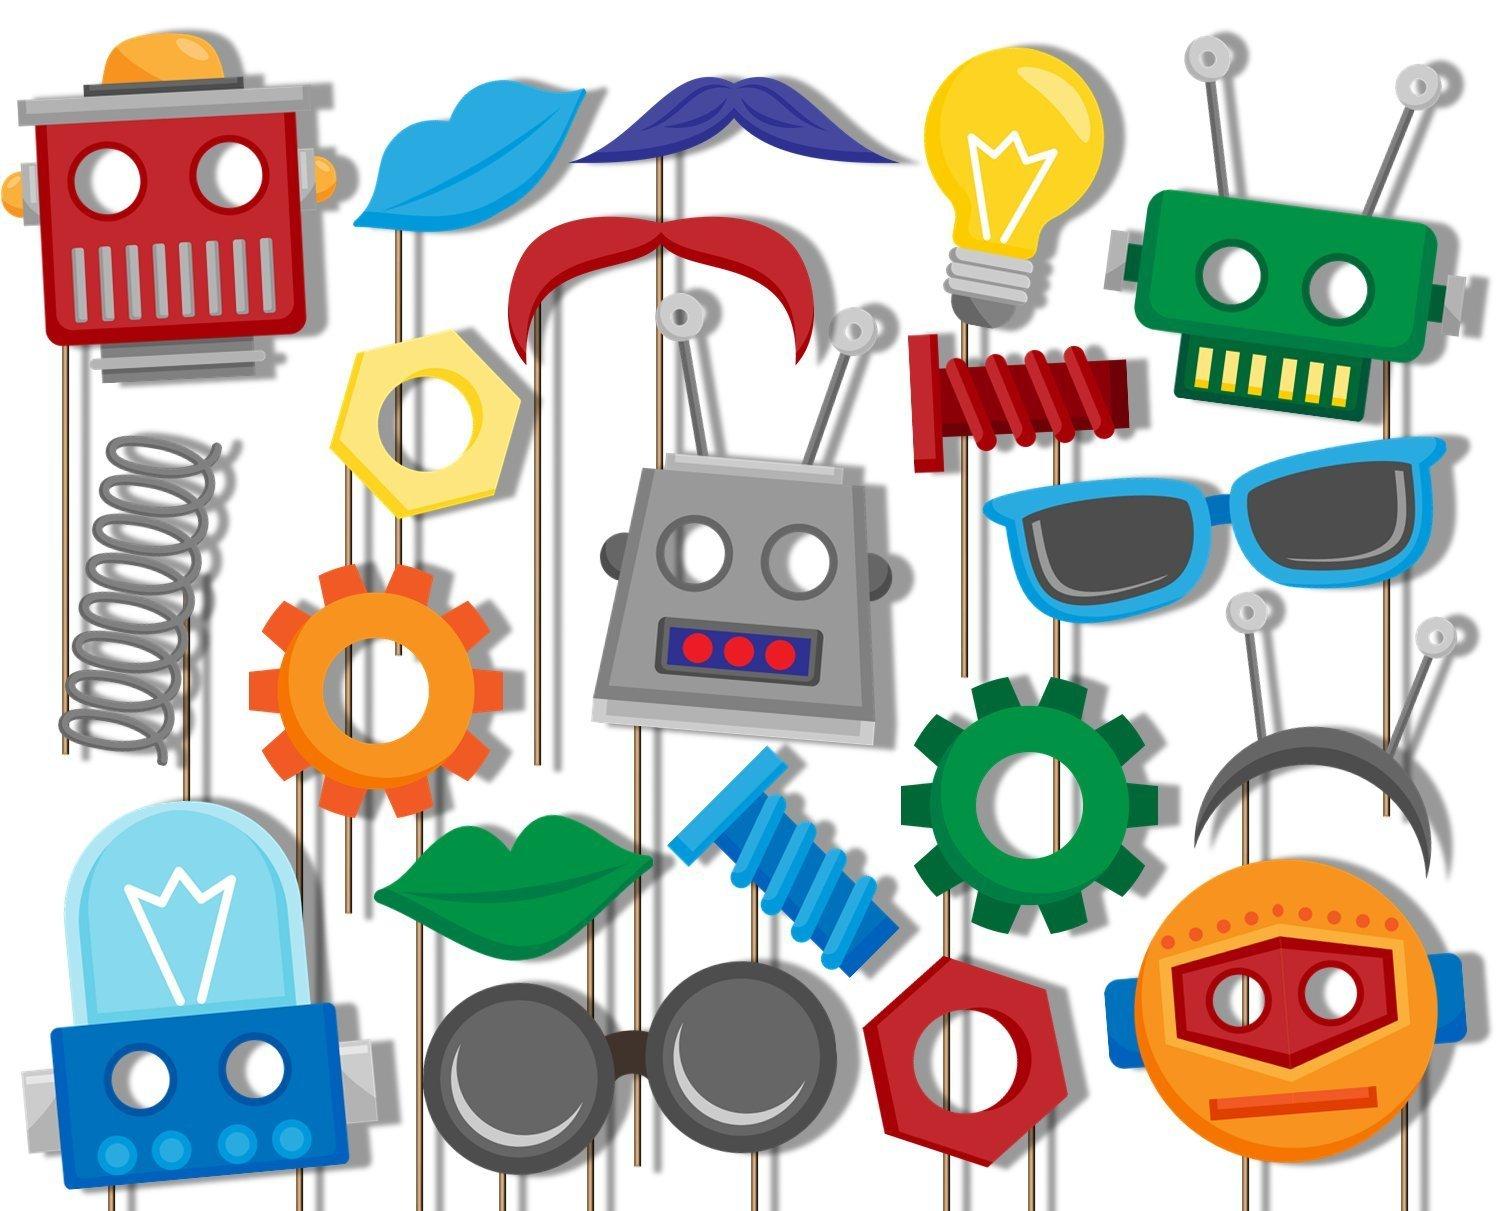 Maker Fun Factory Decor Ideas